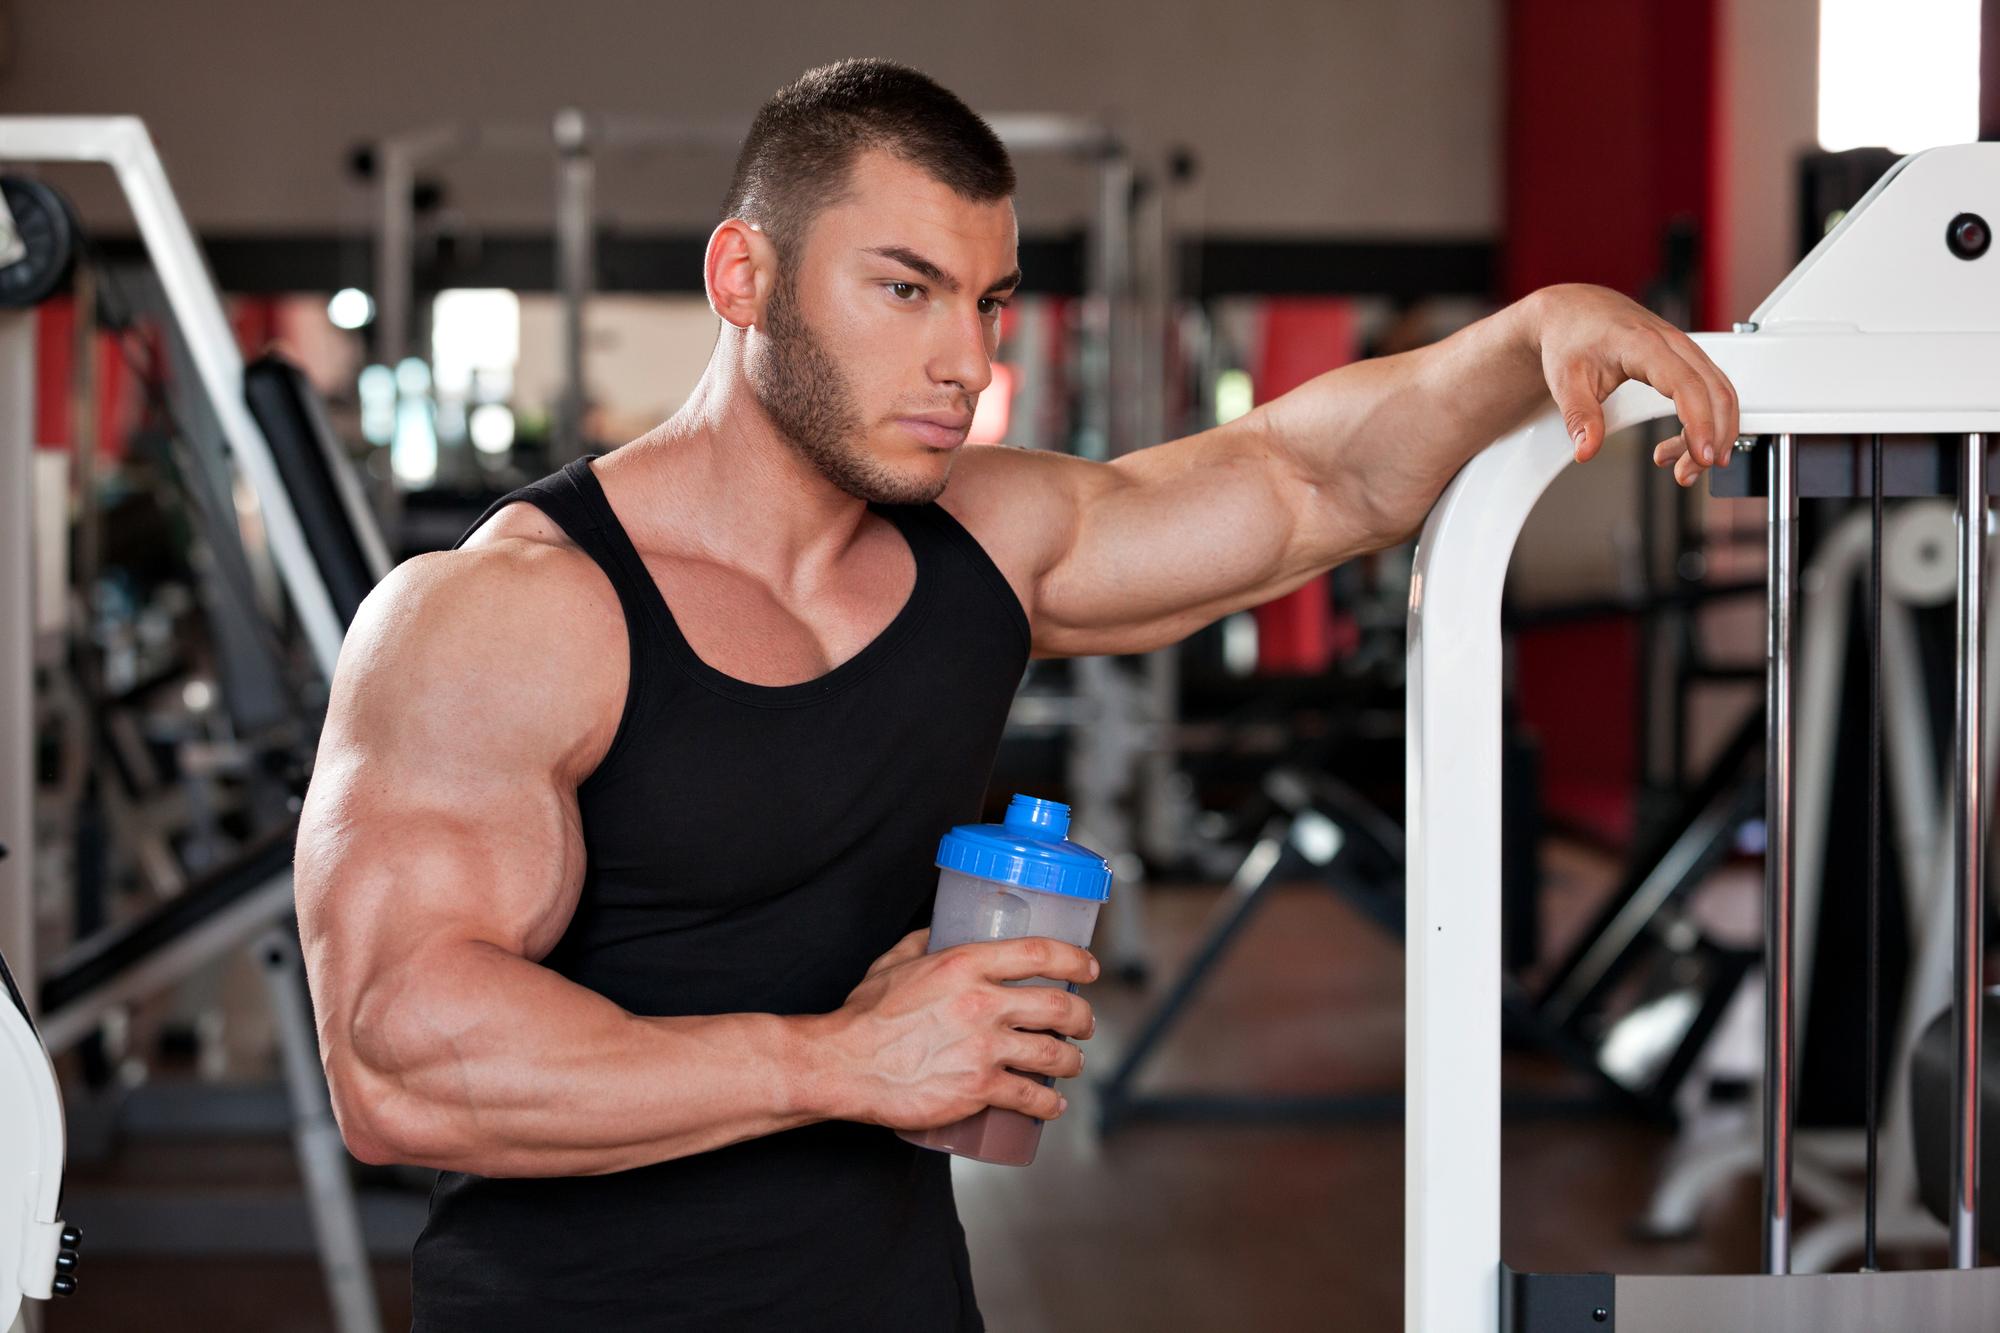 Bodybuilder dating, bodybuilding singles, bodybuilding club